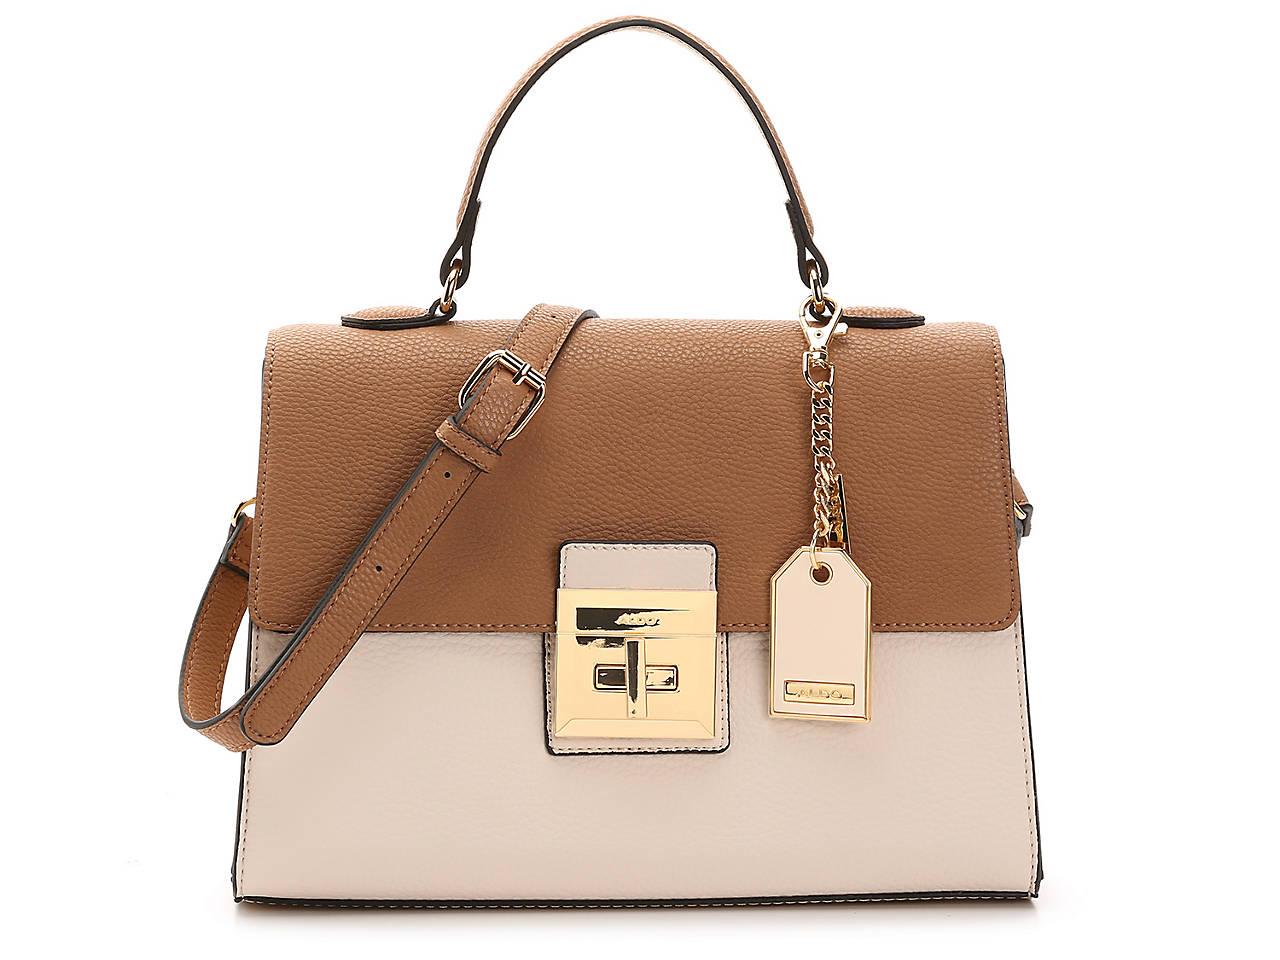 12f24f0a634 Aldo Horound Satchel Women's Handbags & Accessories | DSW